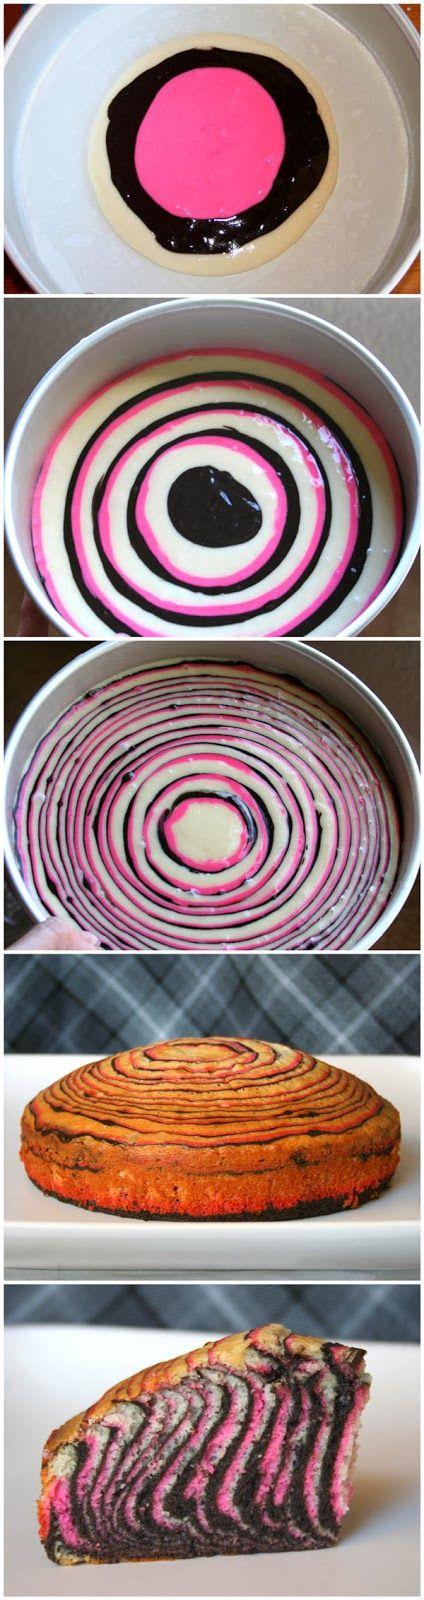 Pink & Zebra Striped Cake Tutorial